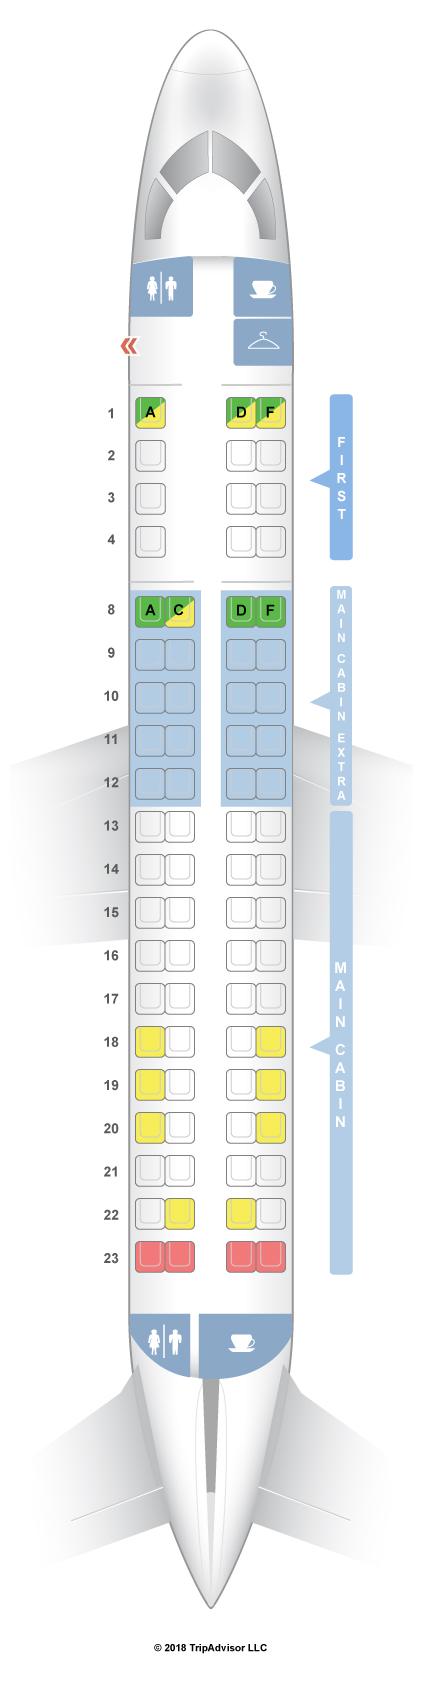 seatguru seat map american airlines embraer erj 175 e75 v1